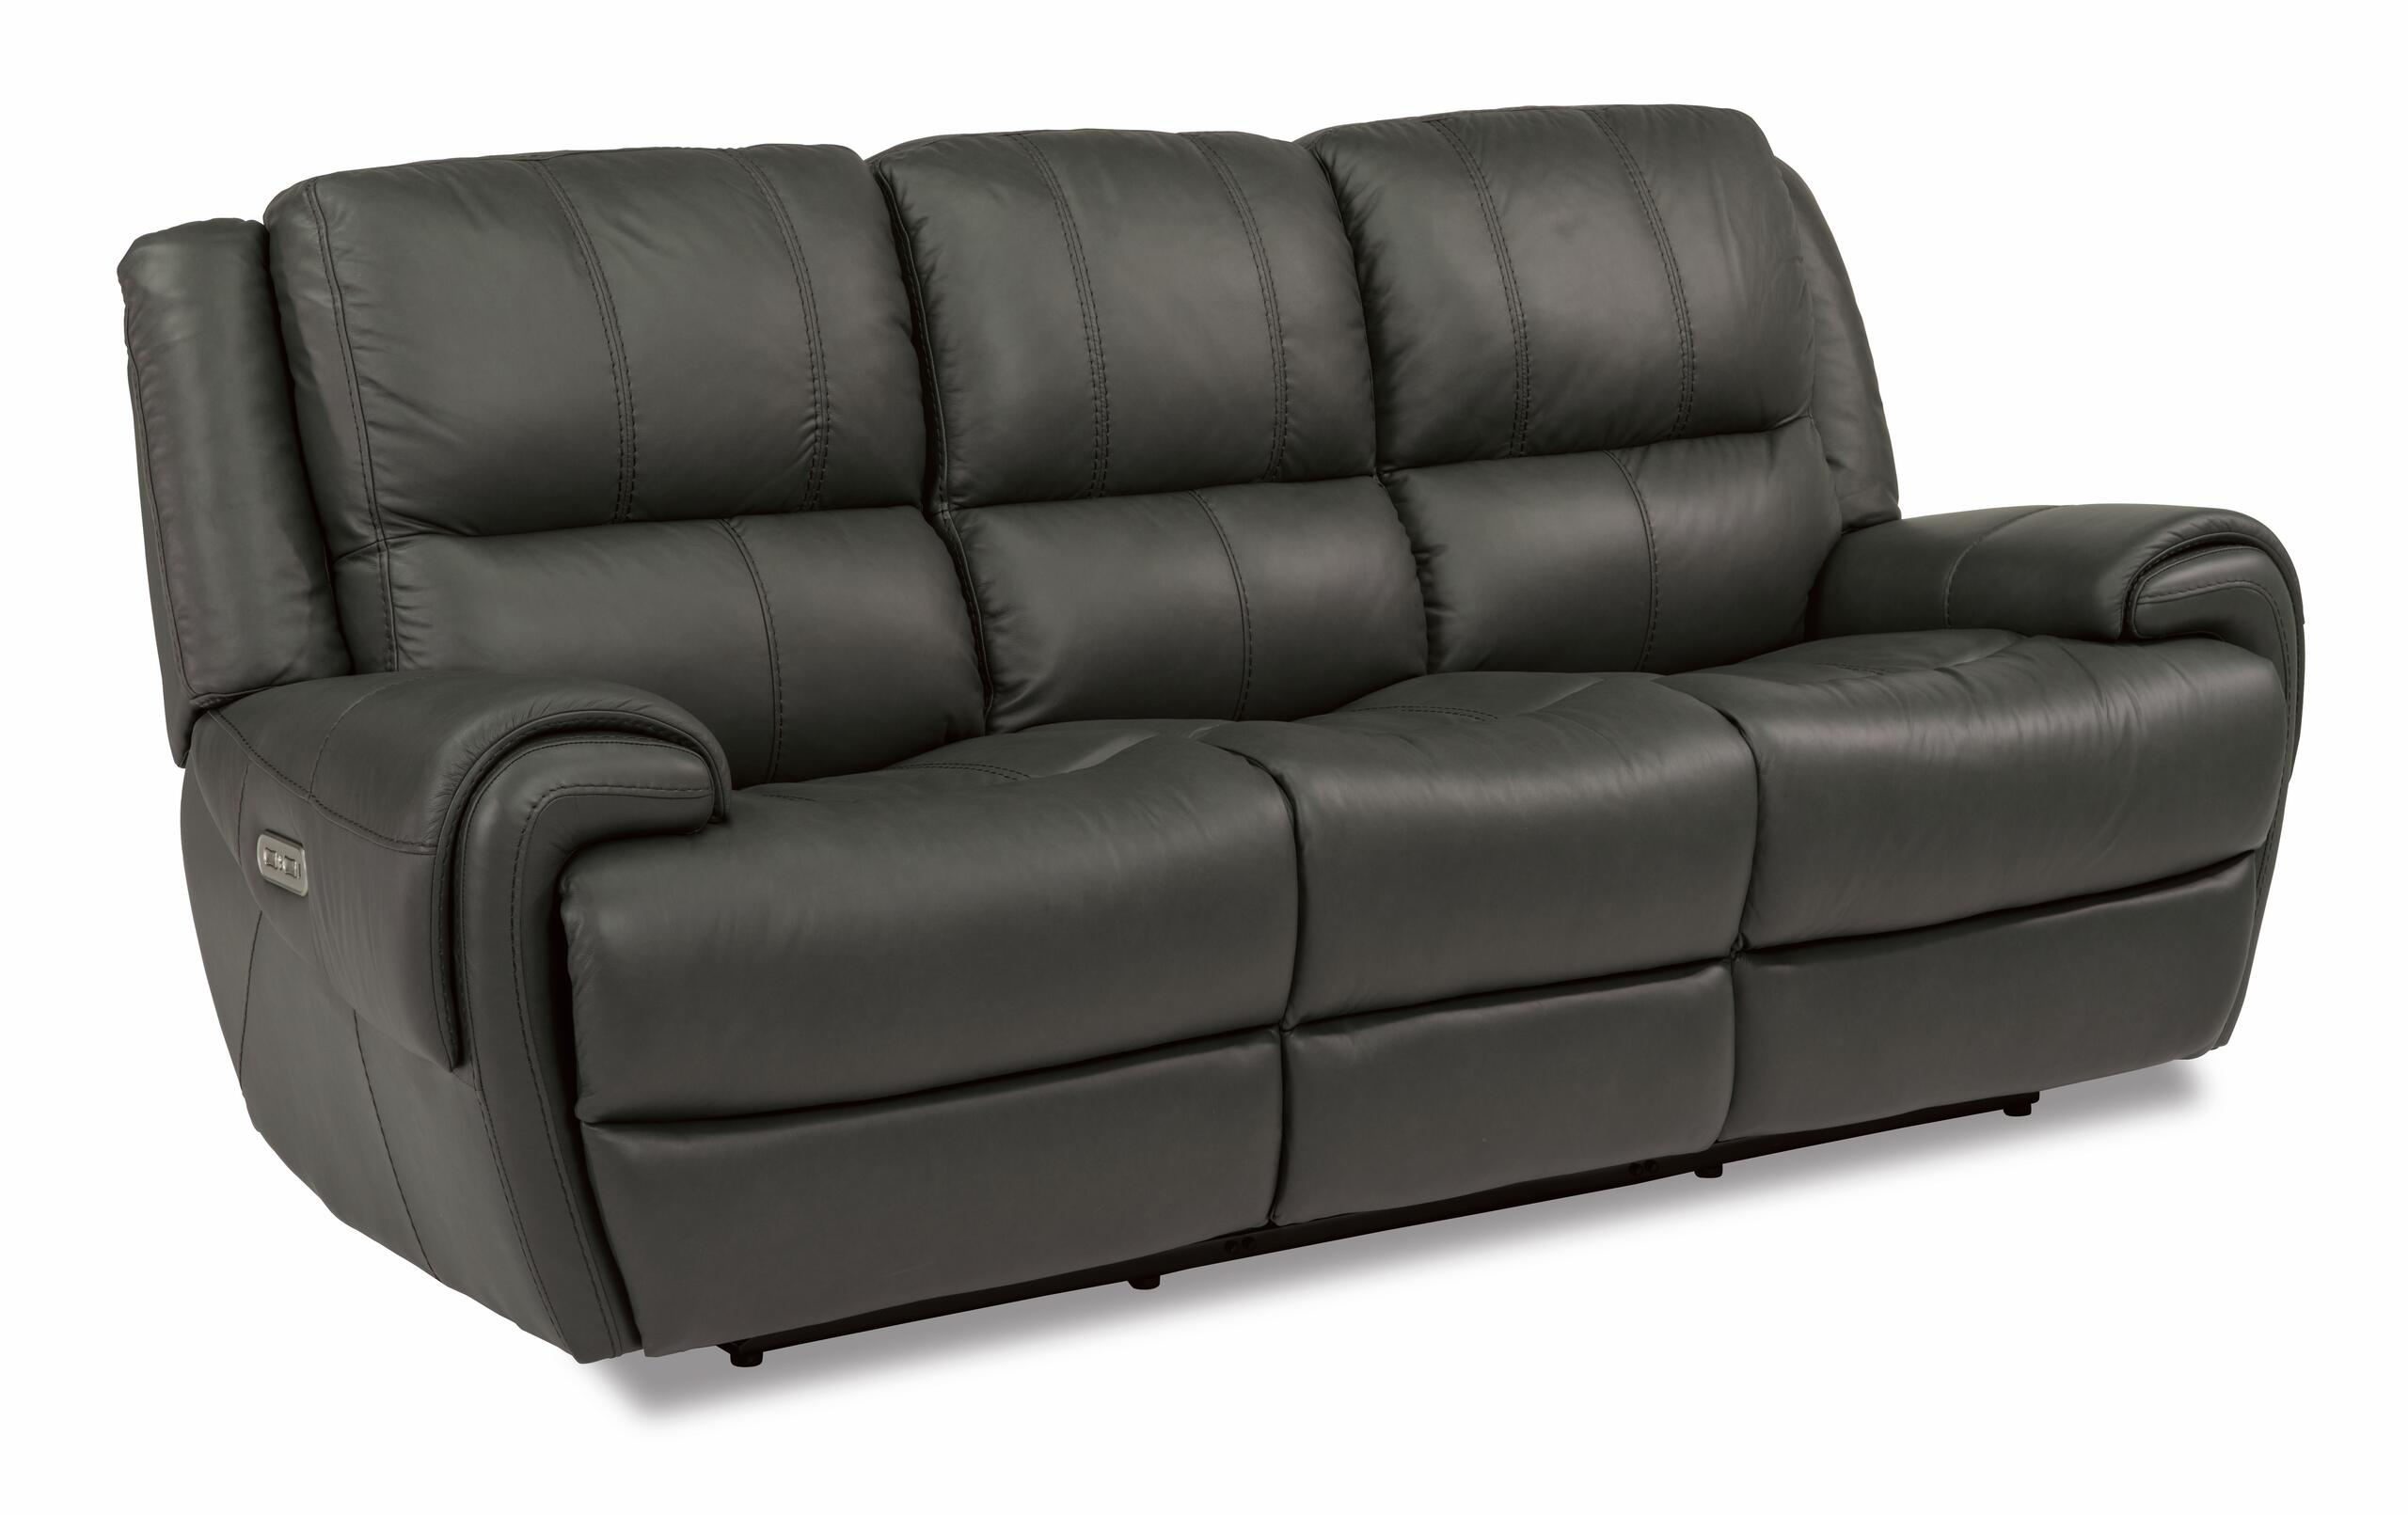 FlexsteelNance Power Reclining Sofa With Power Headrests